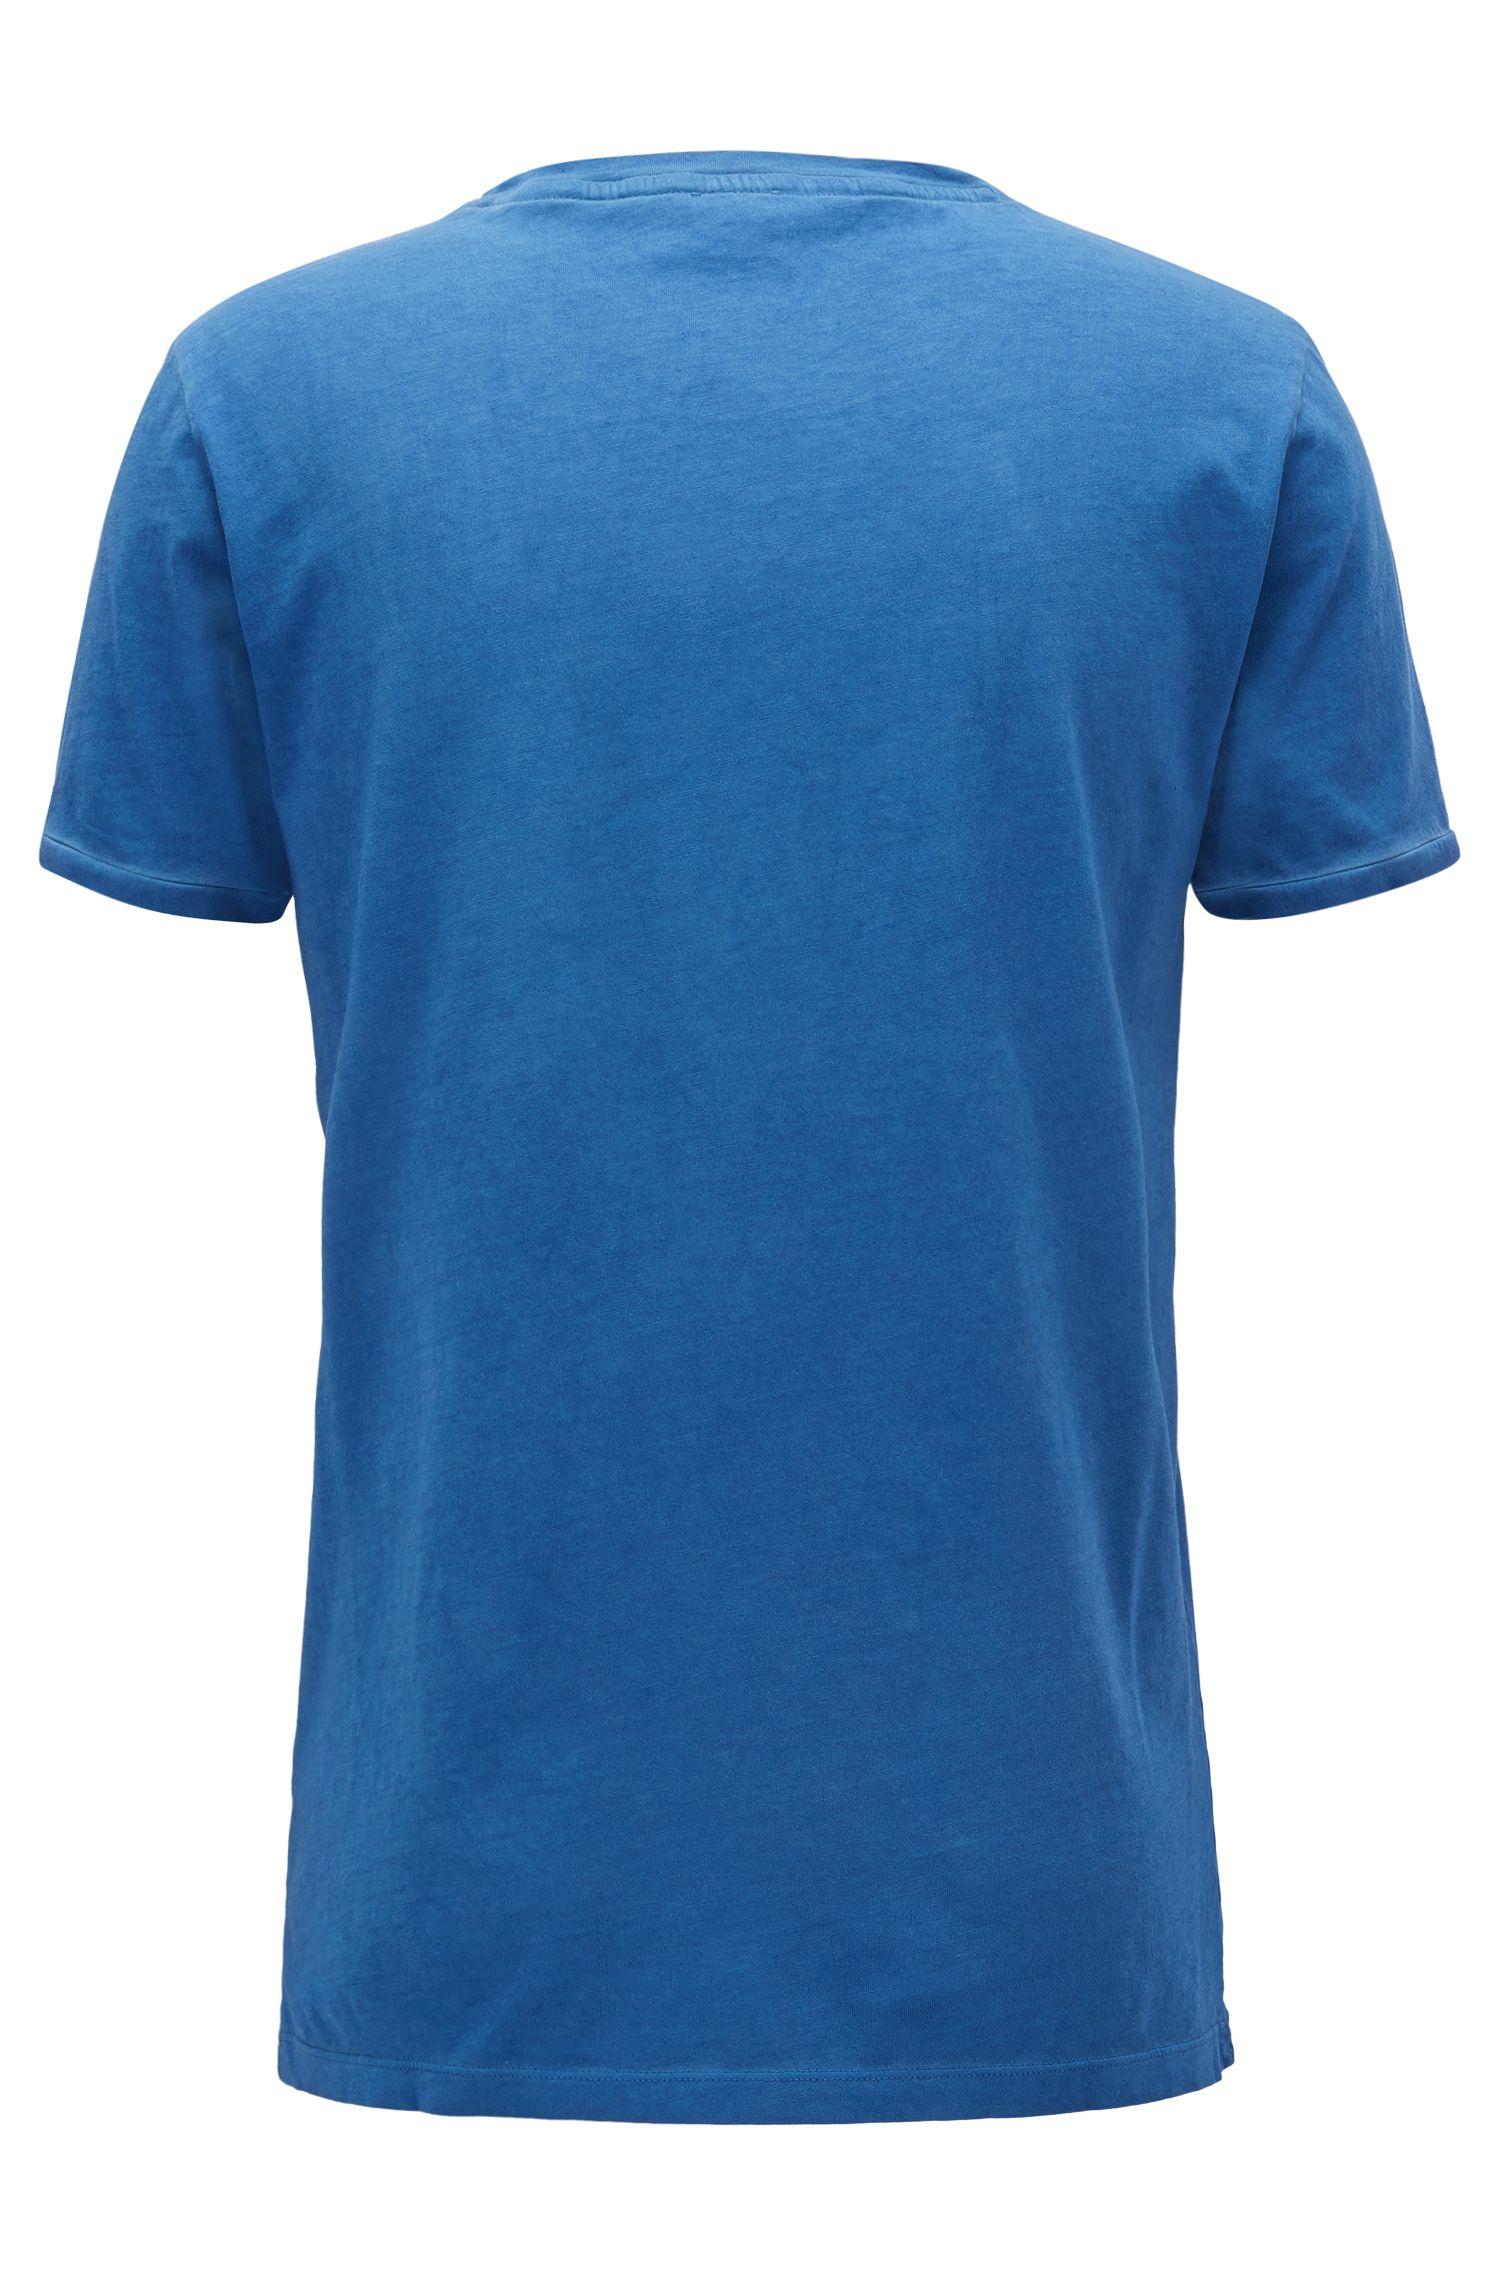 T-shirt Regular Fit en coton teint en pièce